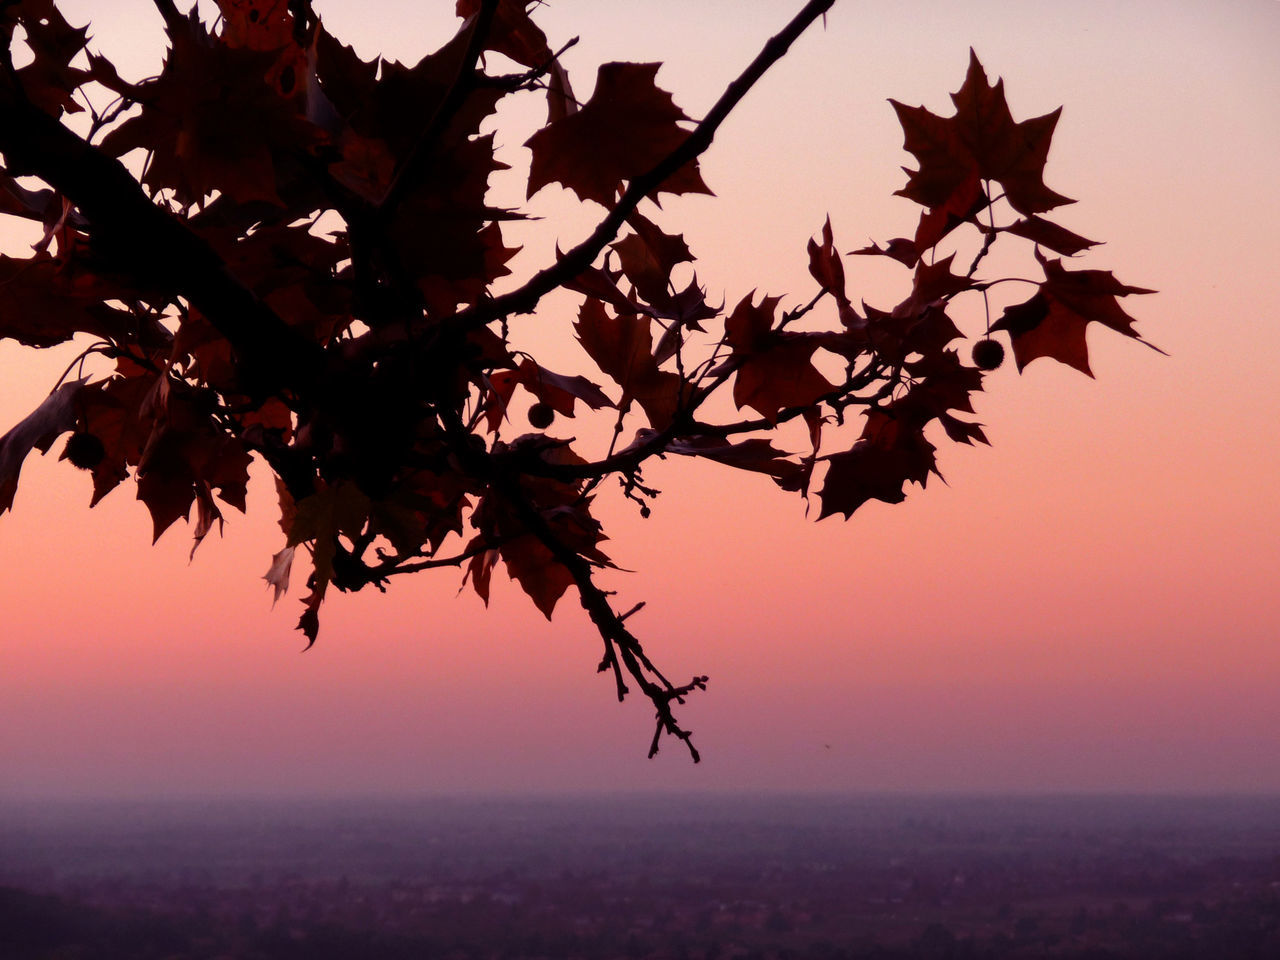 tramonto ad Albinea (Reggio Emilia) Beauty In Nature Branch Leaf Leaves Nature Sky Sunset Tree